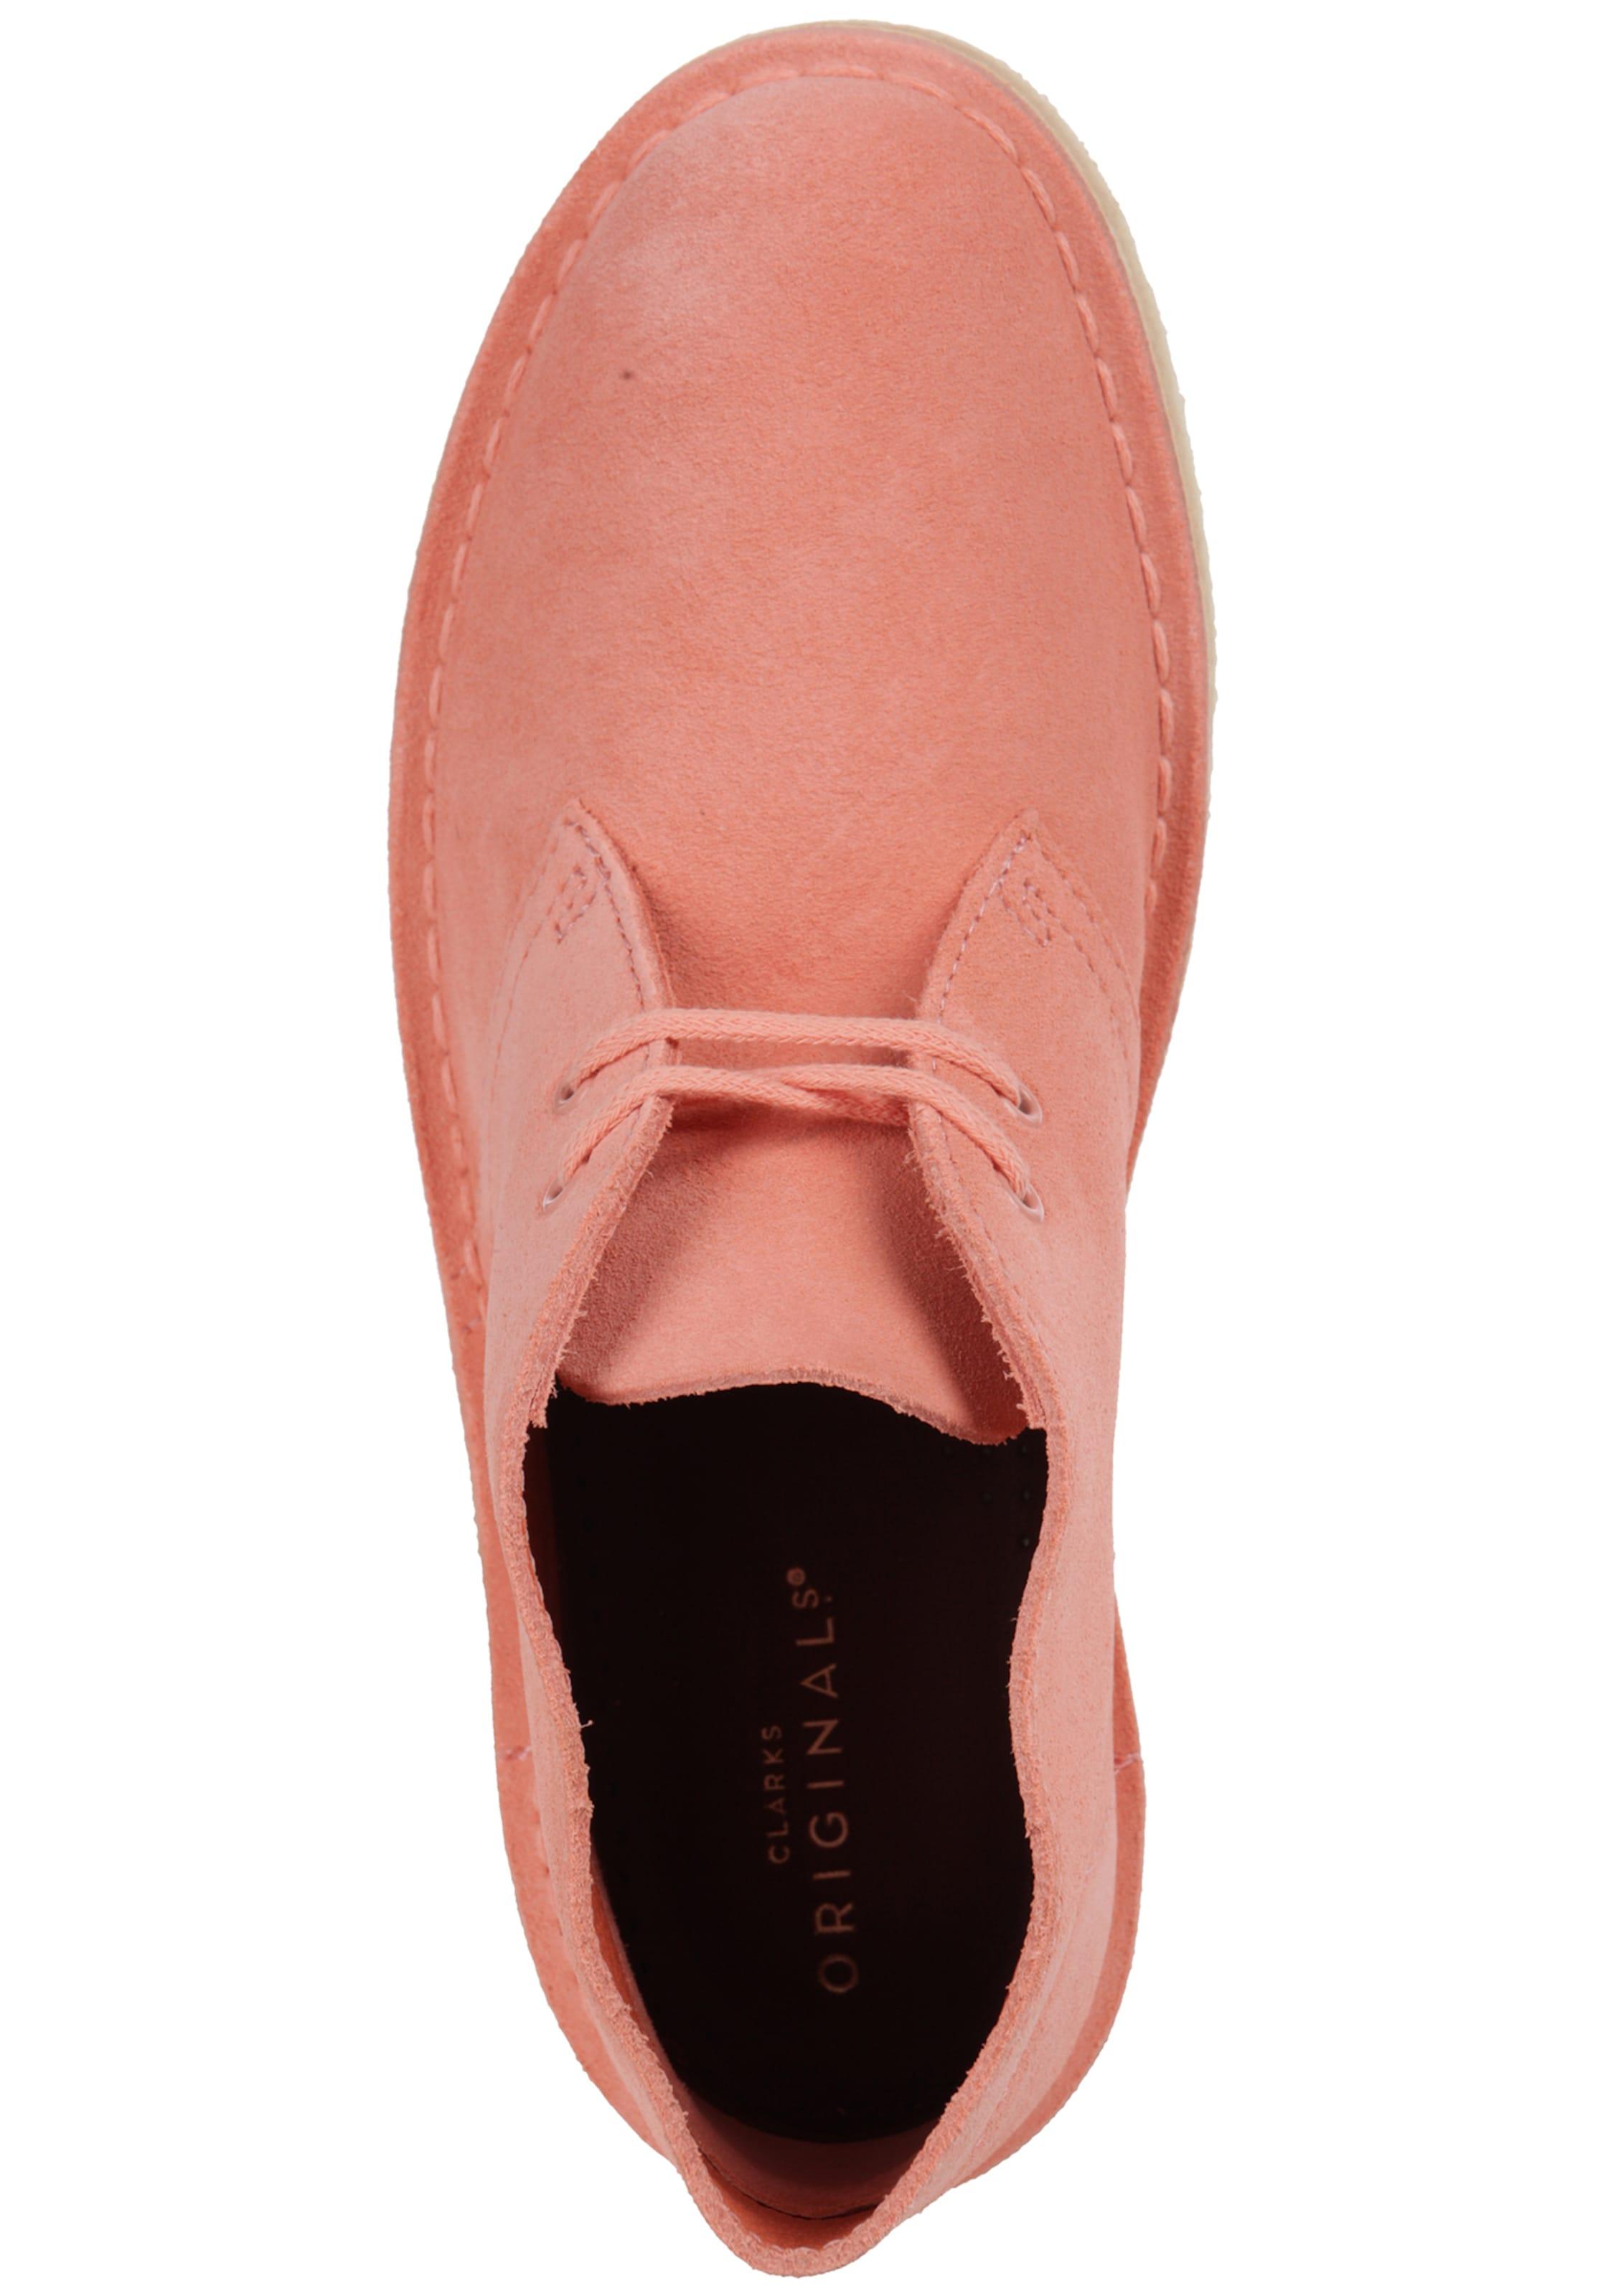 Clarks Originals Clarks Originals Schuhe Lachs In kuTXwOiPZ